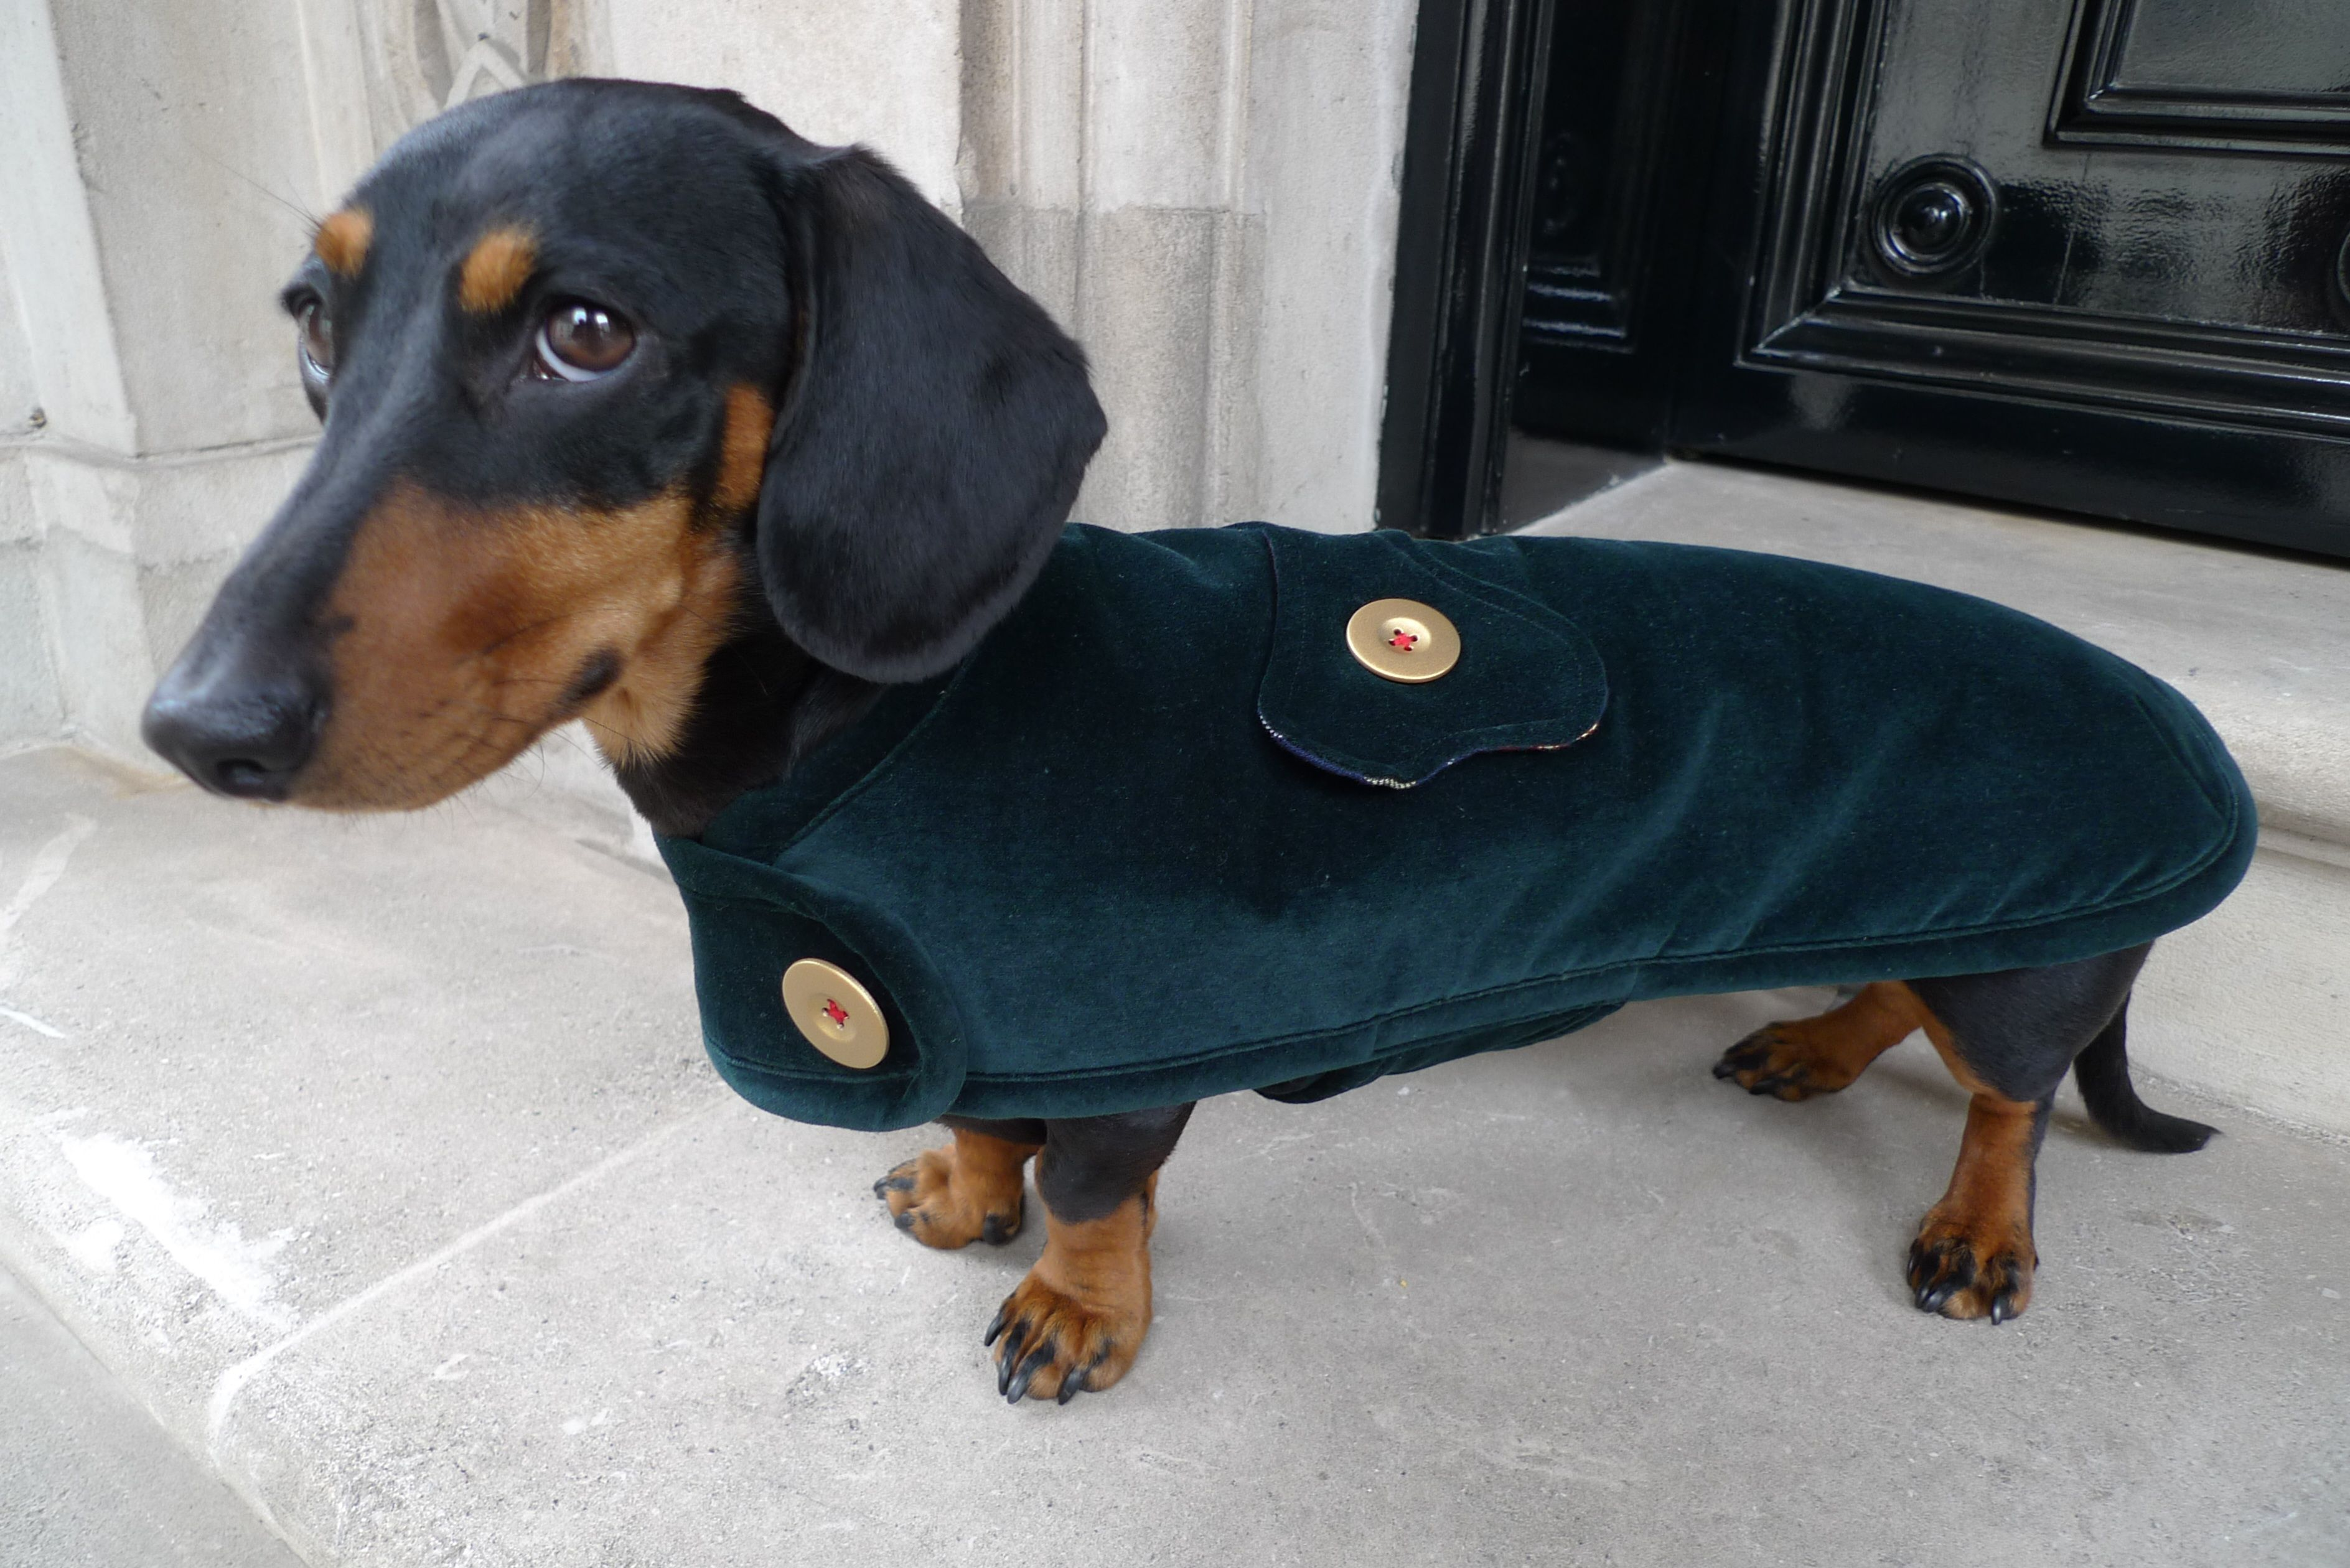 Http Www Simplyspiffingdachshunds Co Uk Velvet Dog Dachshund